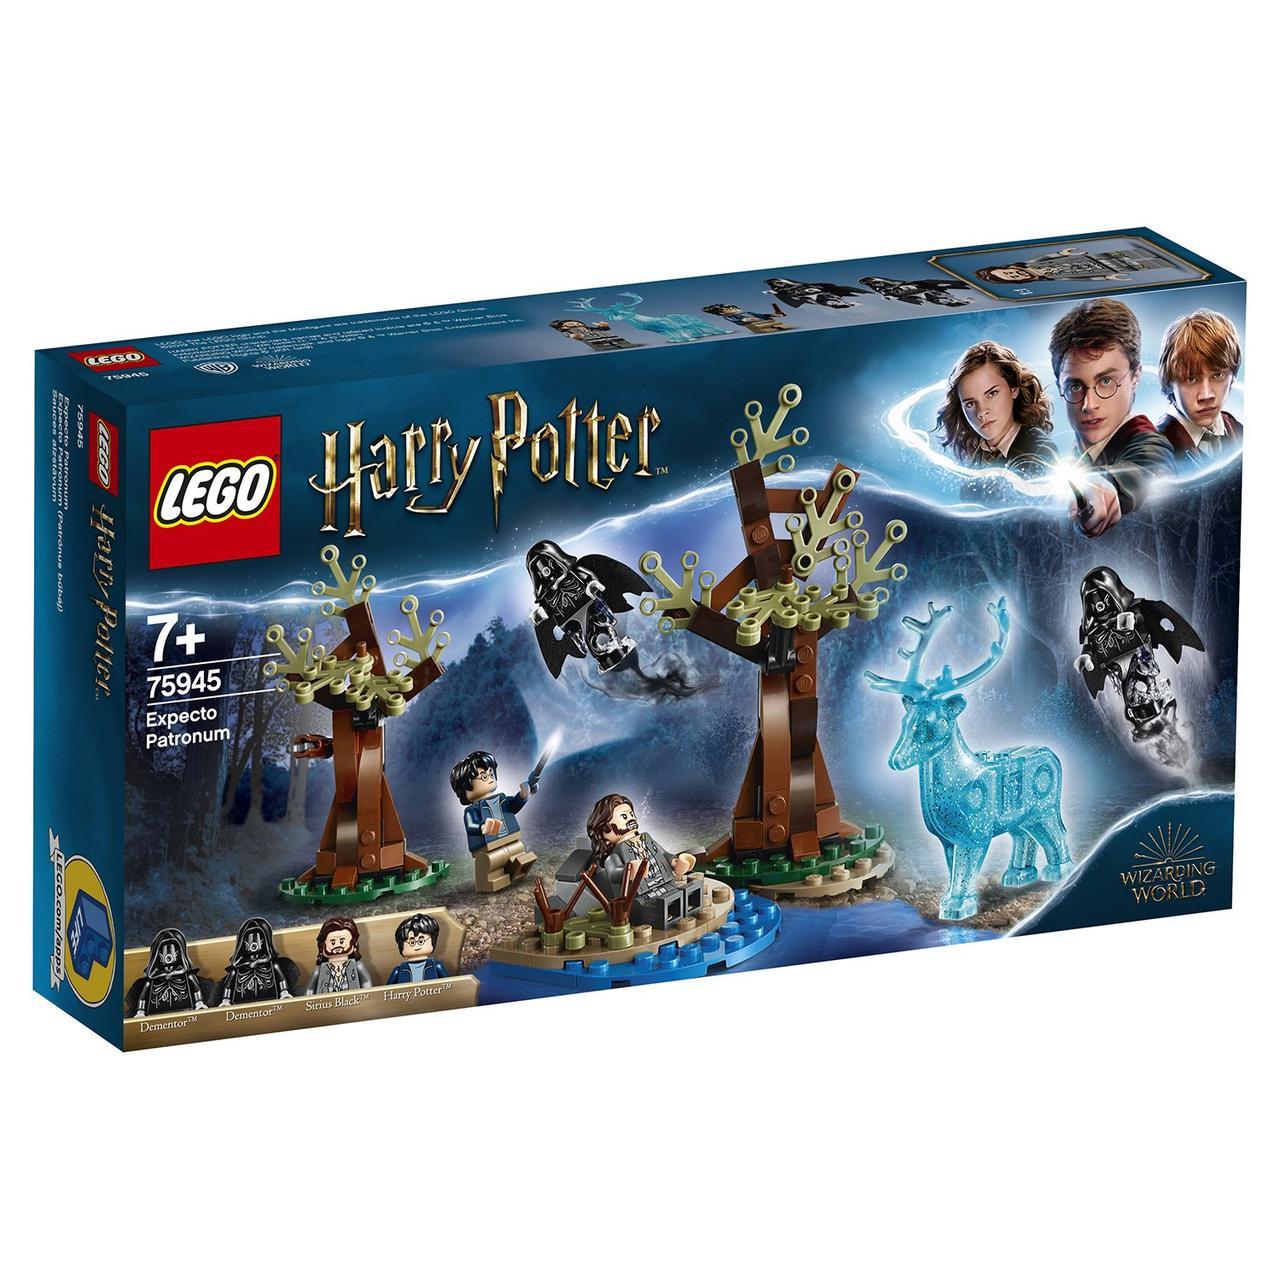 75945 Lego Harry Potter Экспекто Патронум!, Лего Гарри Поттер